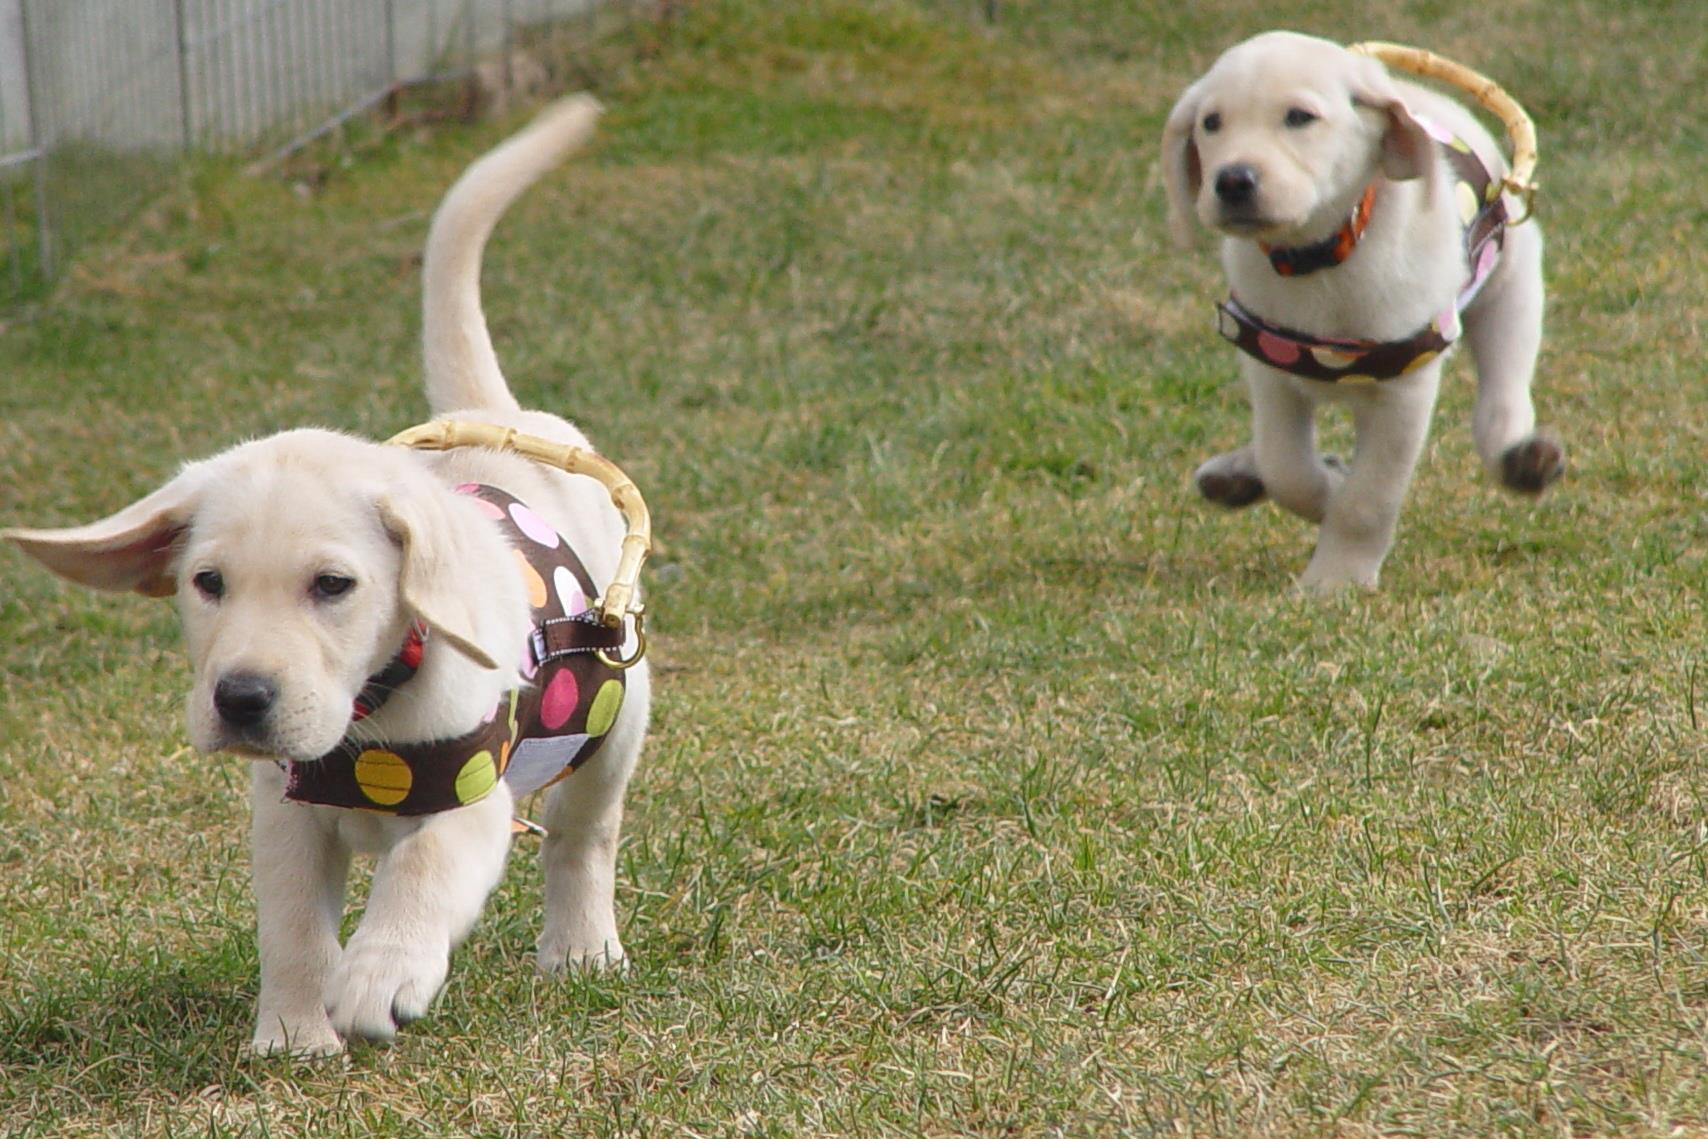 2012-12-14-Pupsrunninginharnesses.jpg